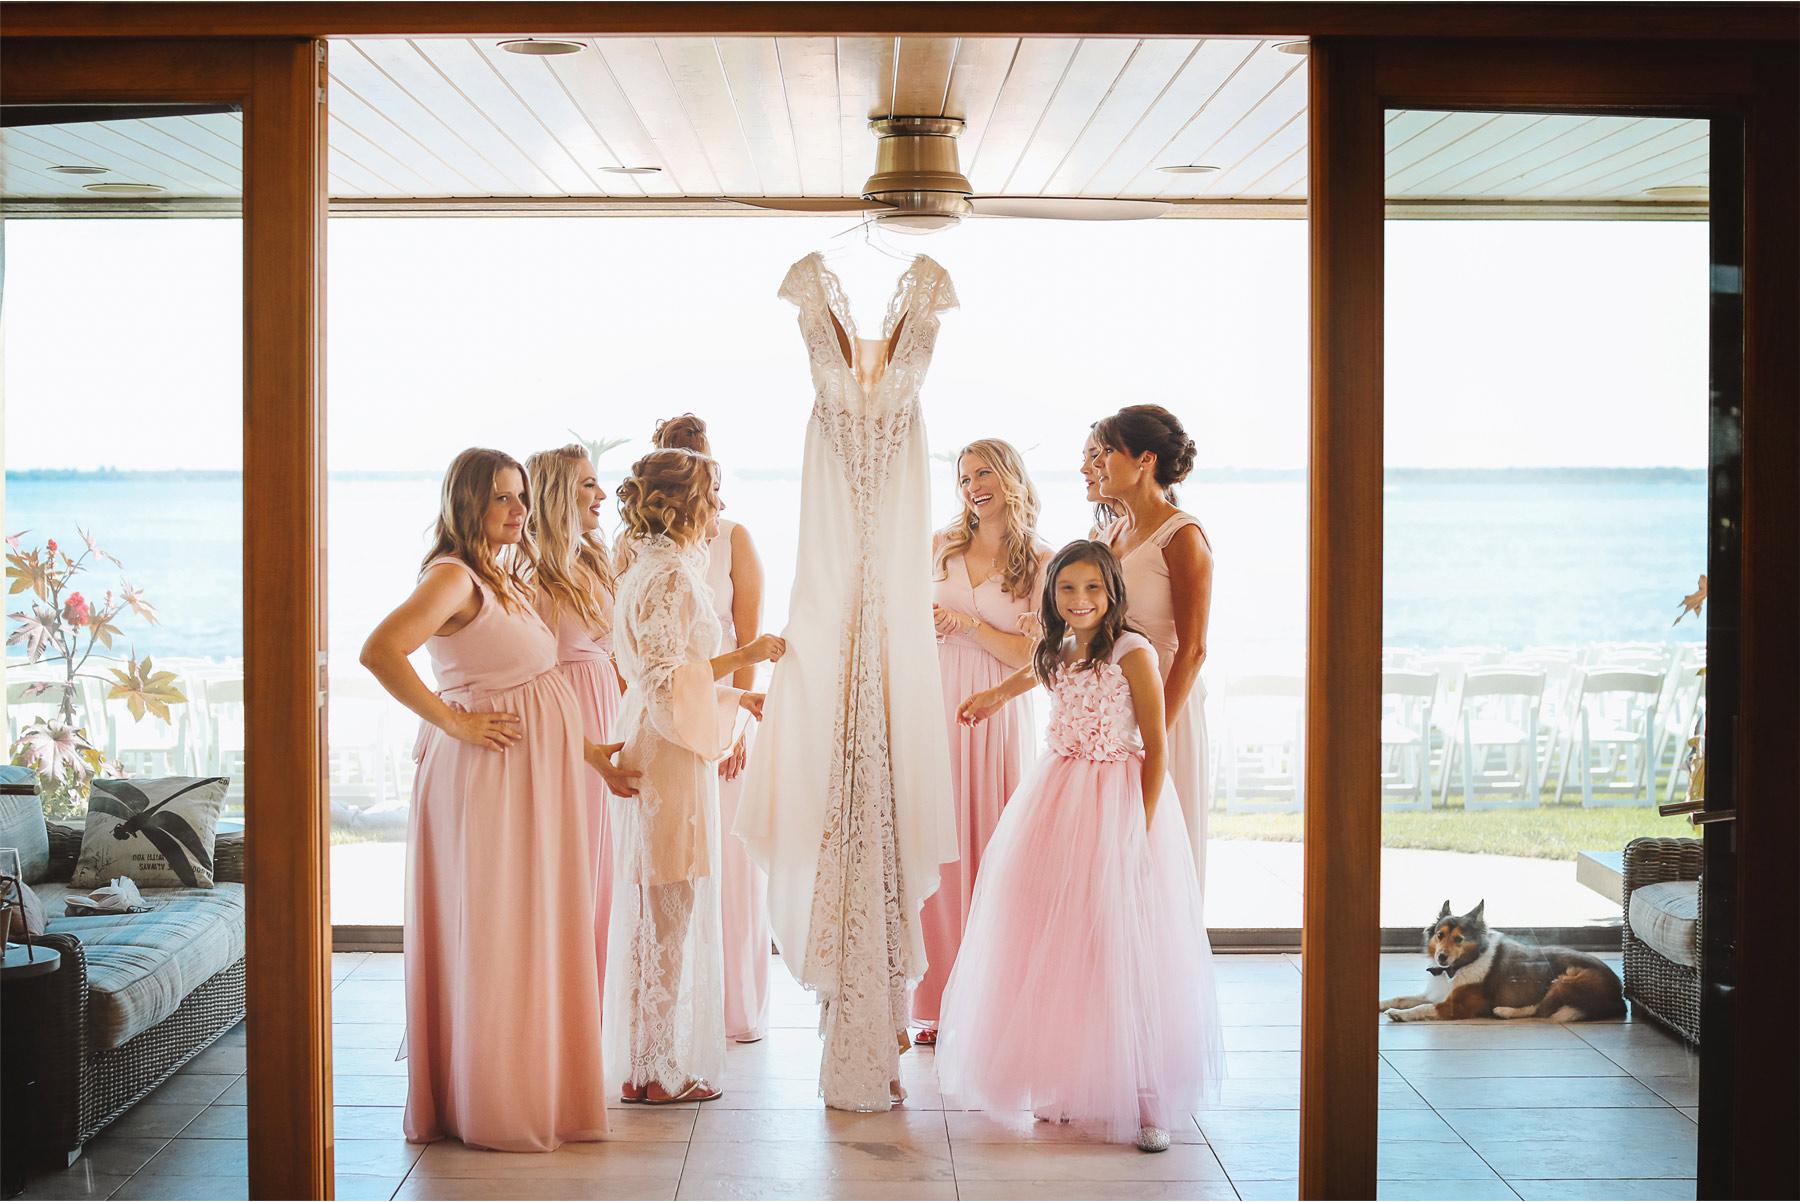 03-Vick-Photography-Wedding-Ottertail-Minnesota-Alice-in-Wonderland-Theme-Bride-Bridesmaids-Dress-Lake-Tess-and-Greg.jpg